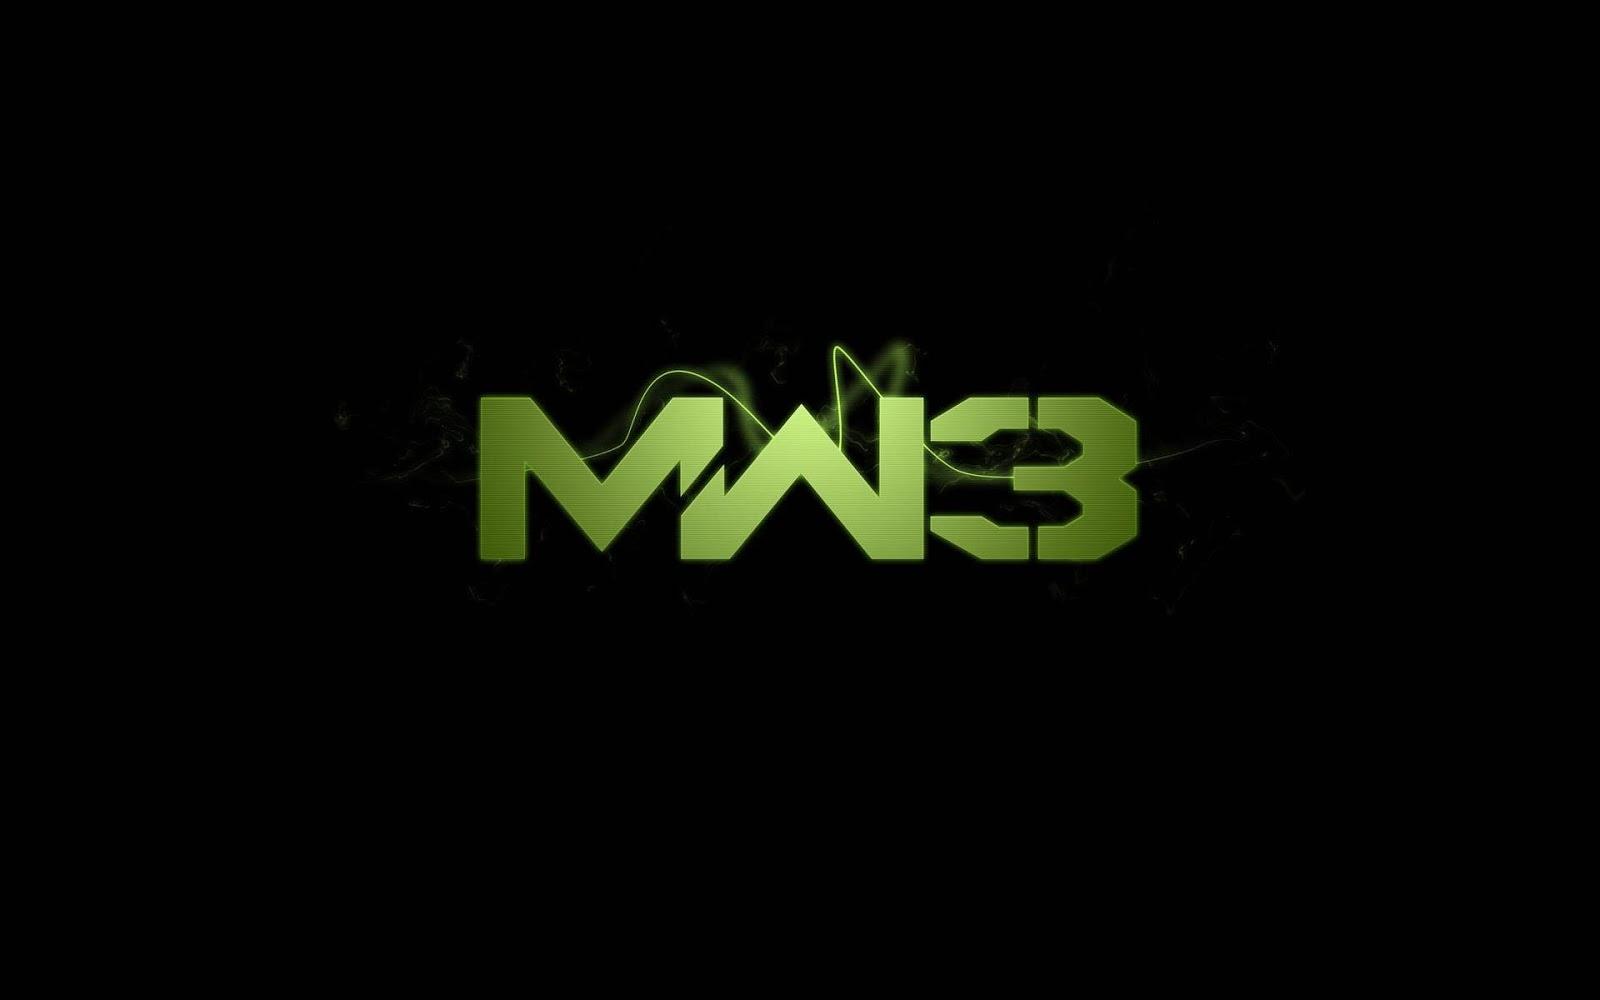 HD WALLPAPERS Call of Duty Modern Warfare 3 HD Wallpapers 1600x1000